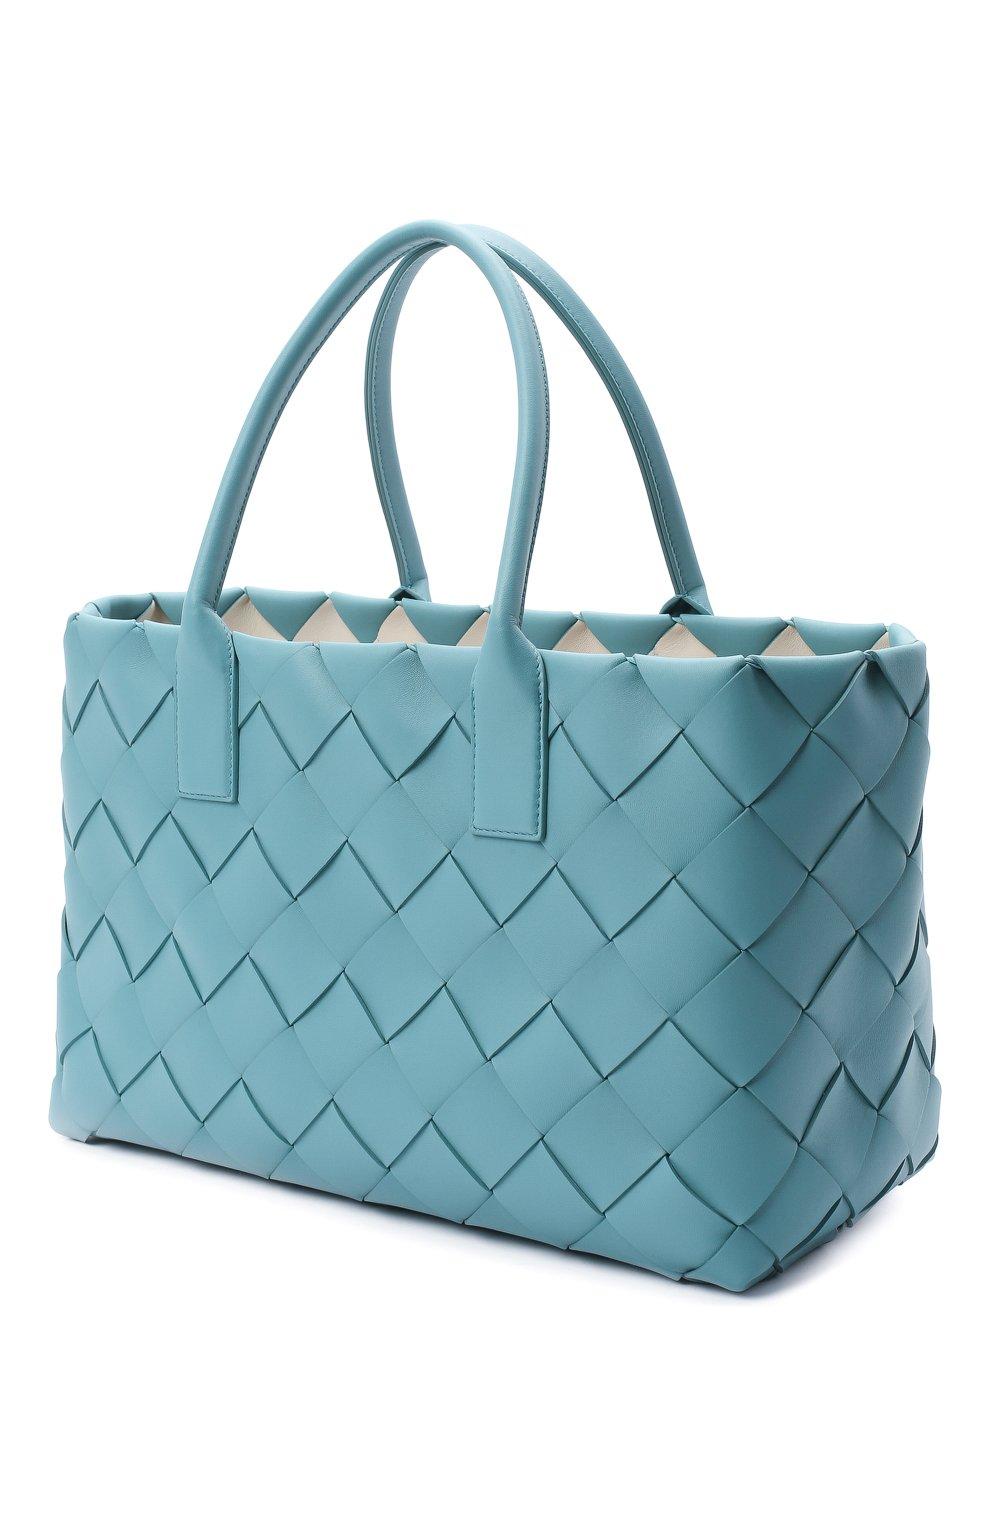 Женский сумка-тоут BOTTEGA VENETA голубого цвета, арт. 630817/VMAY3 | Фото 3